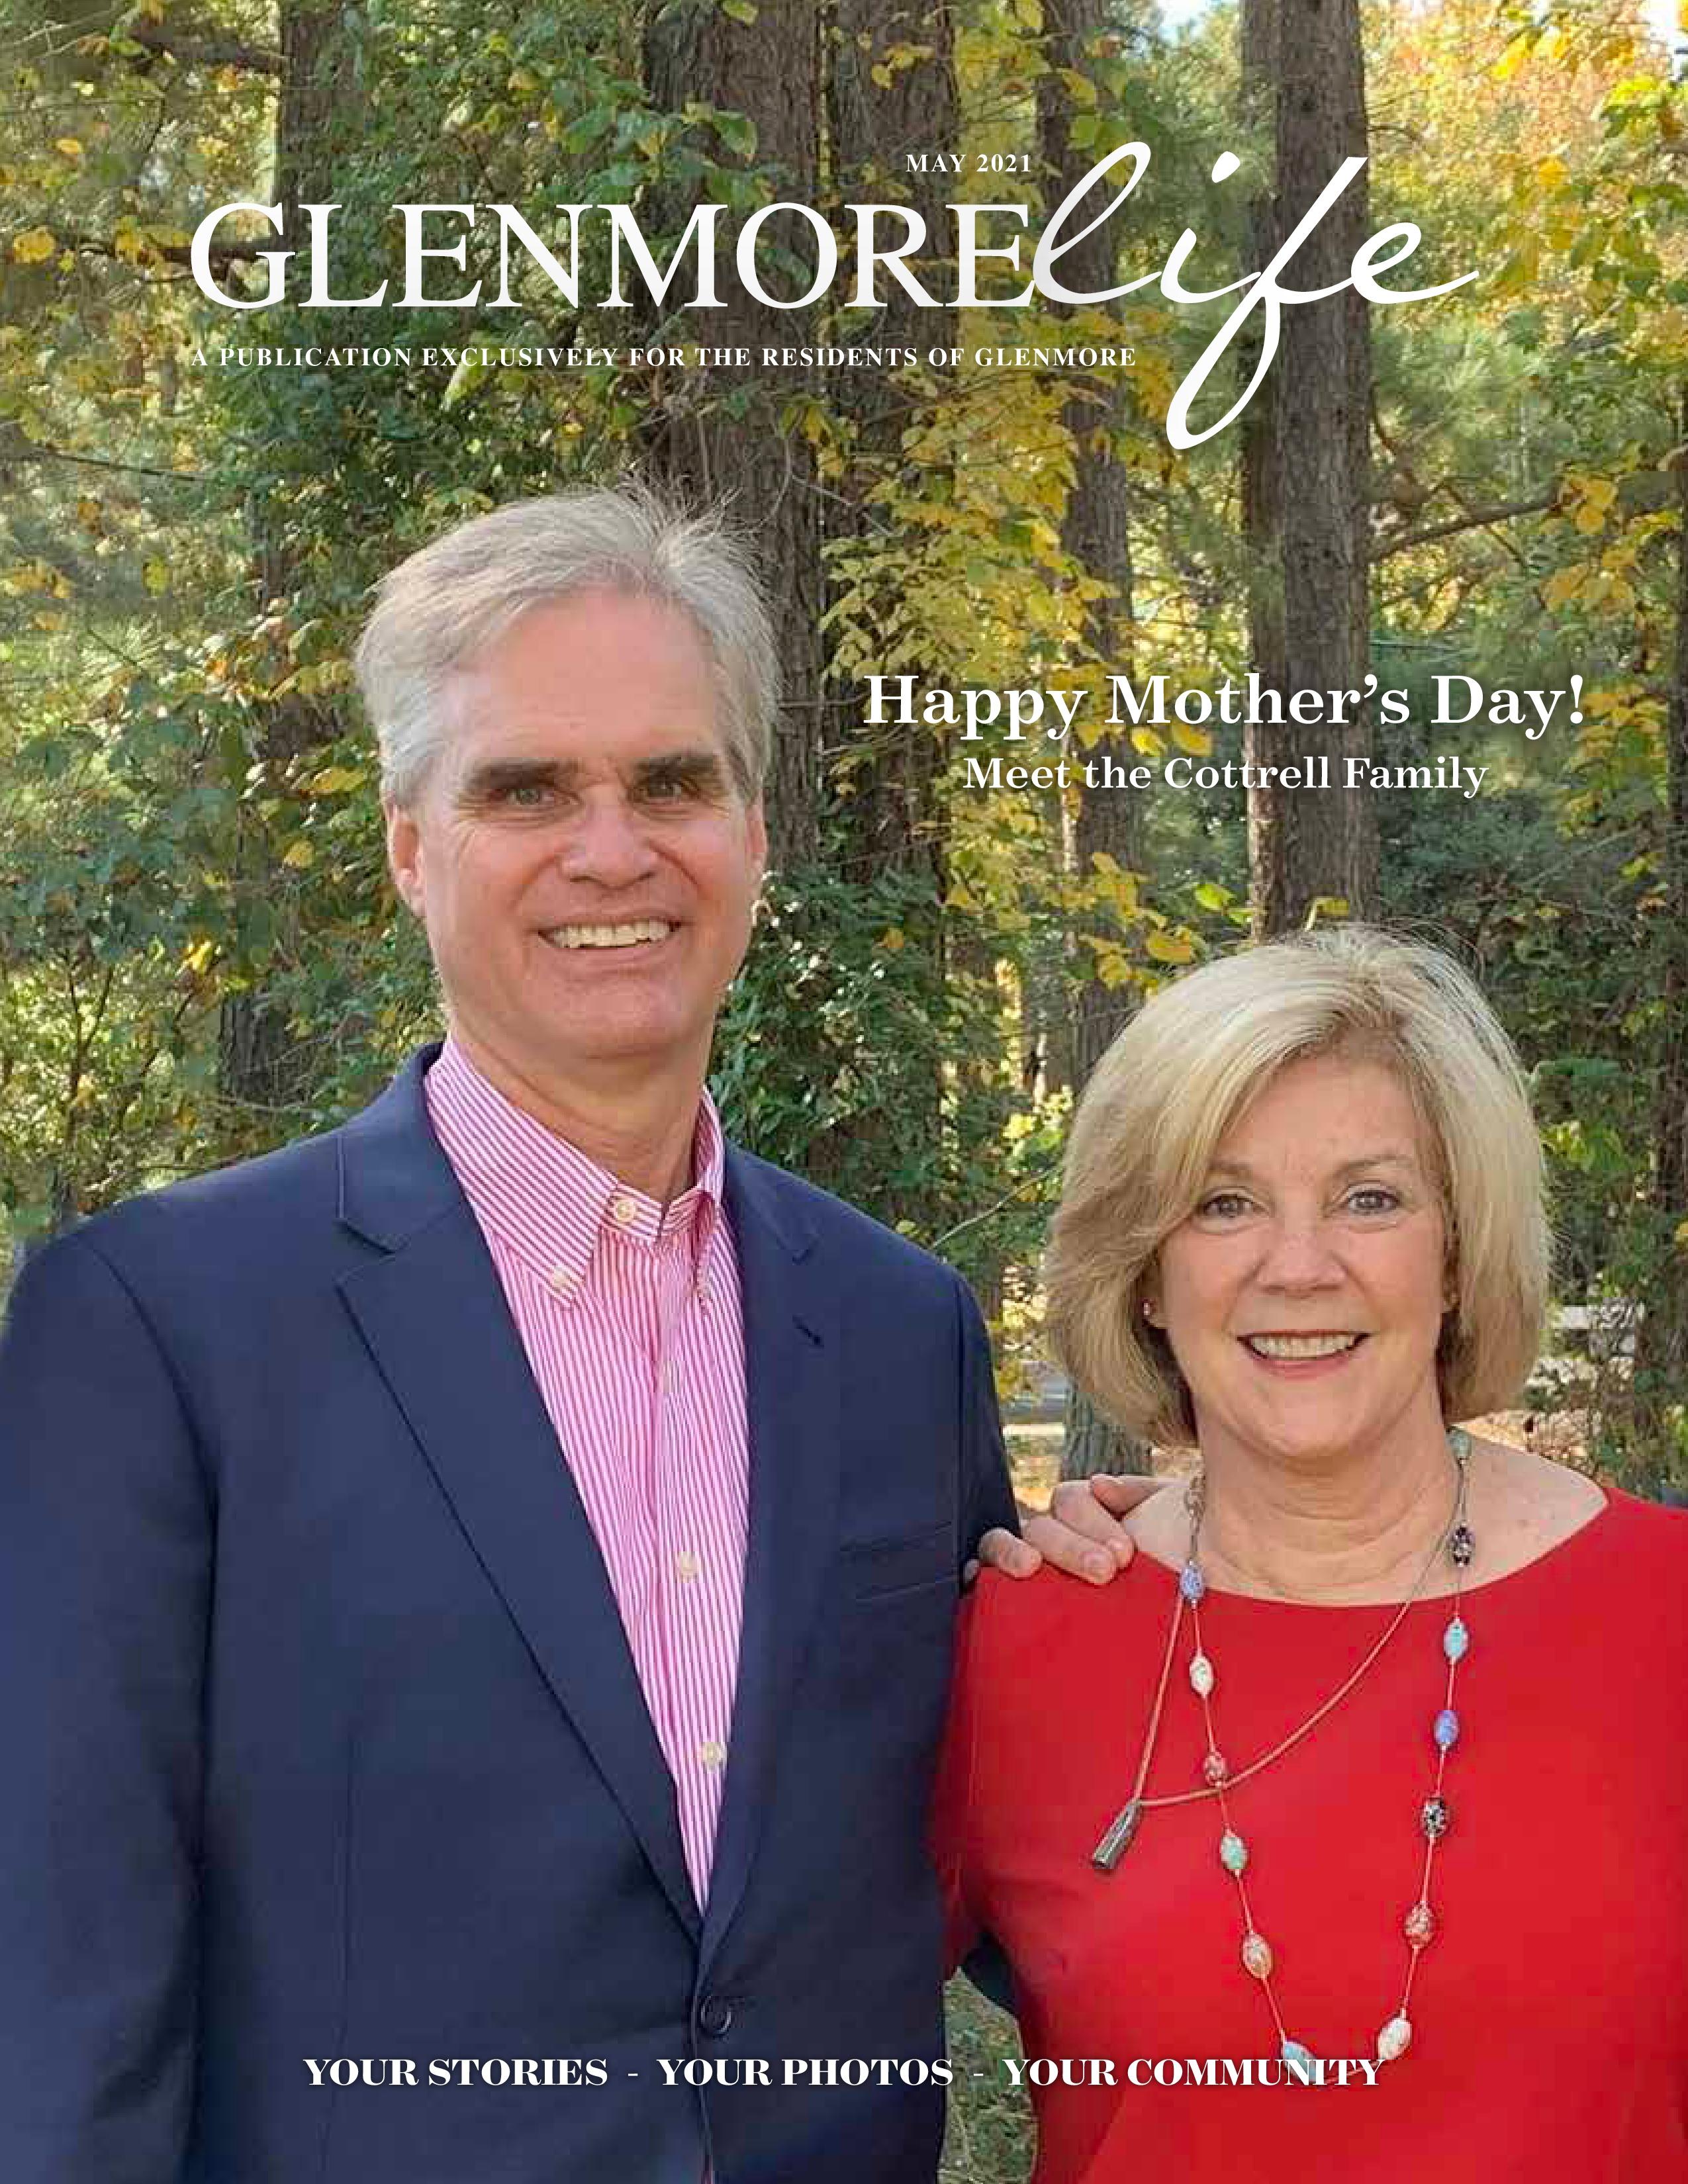 Glenmore Life 2021-05-01